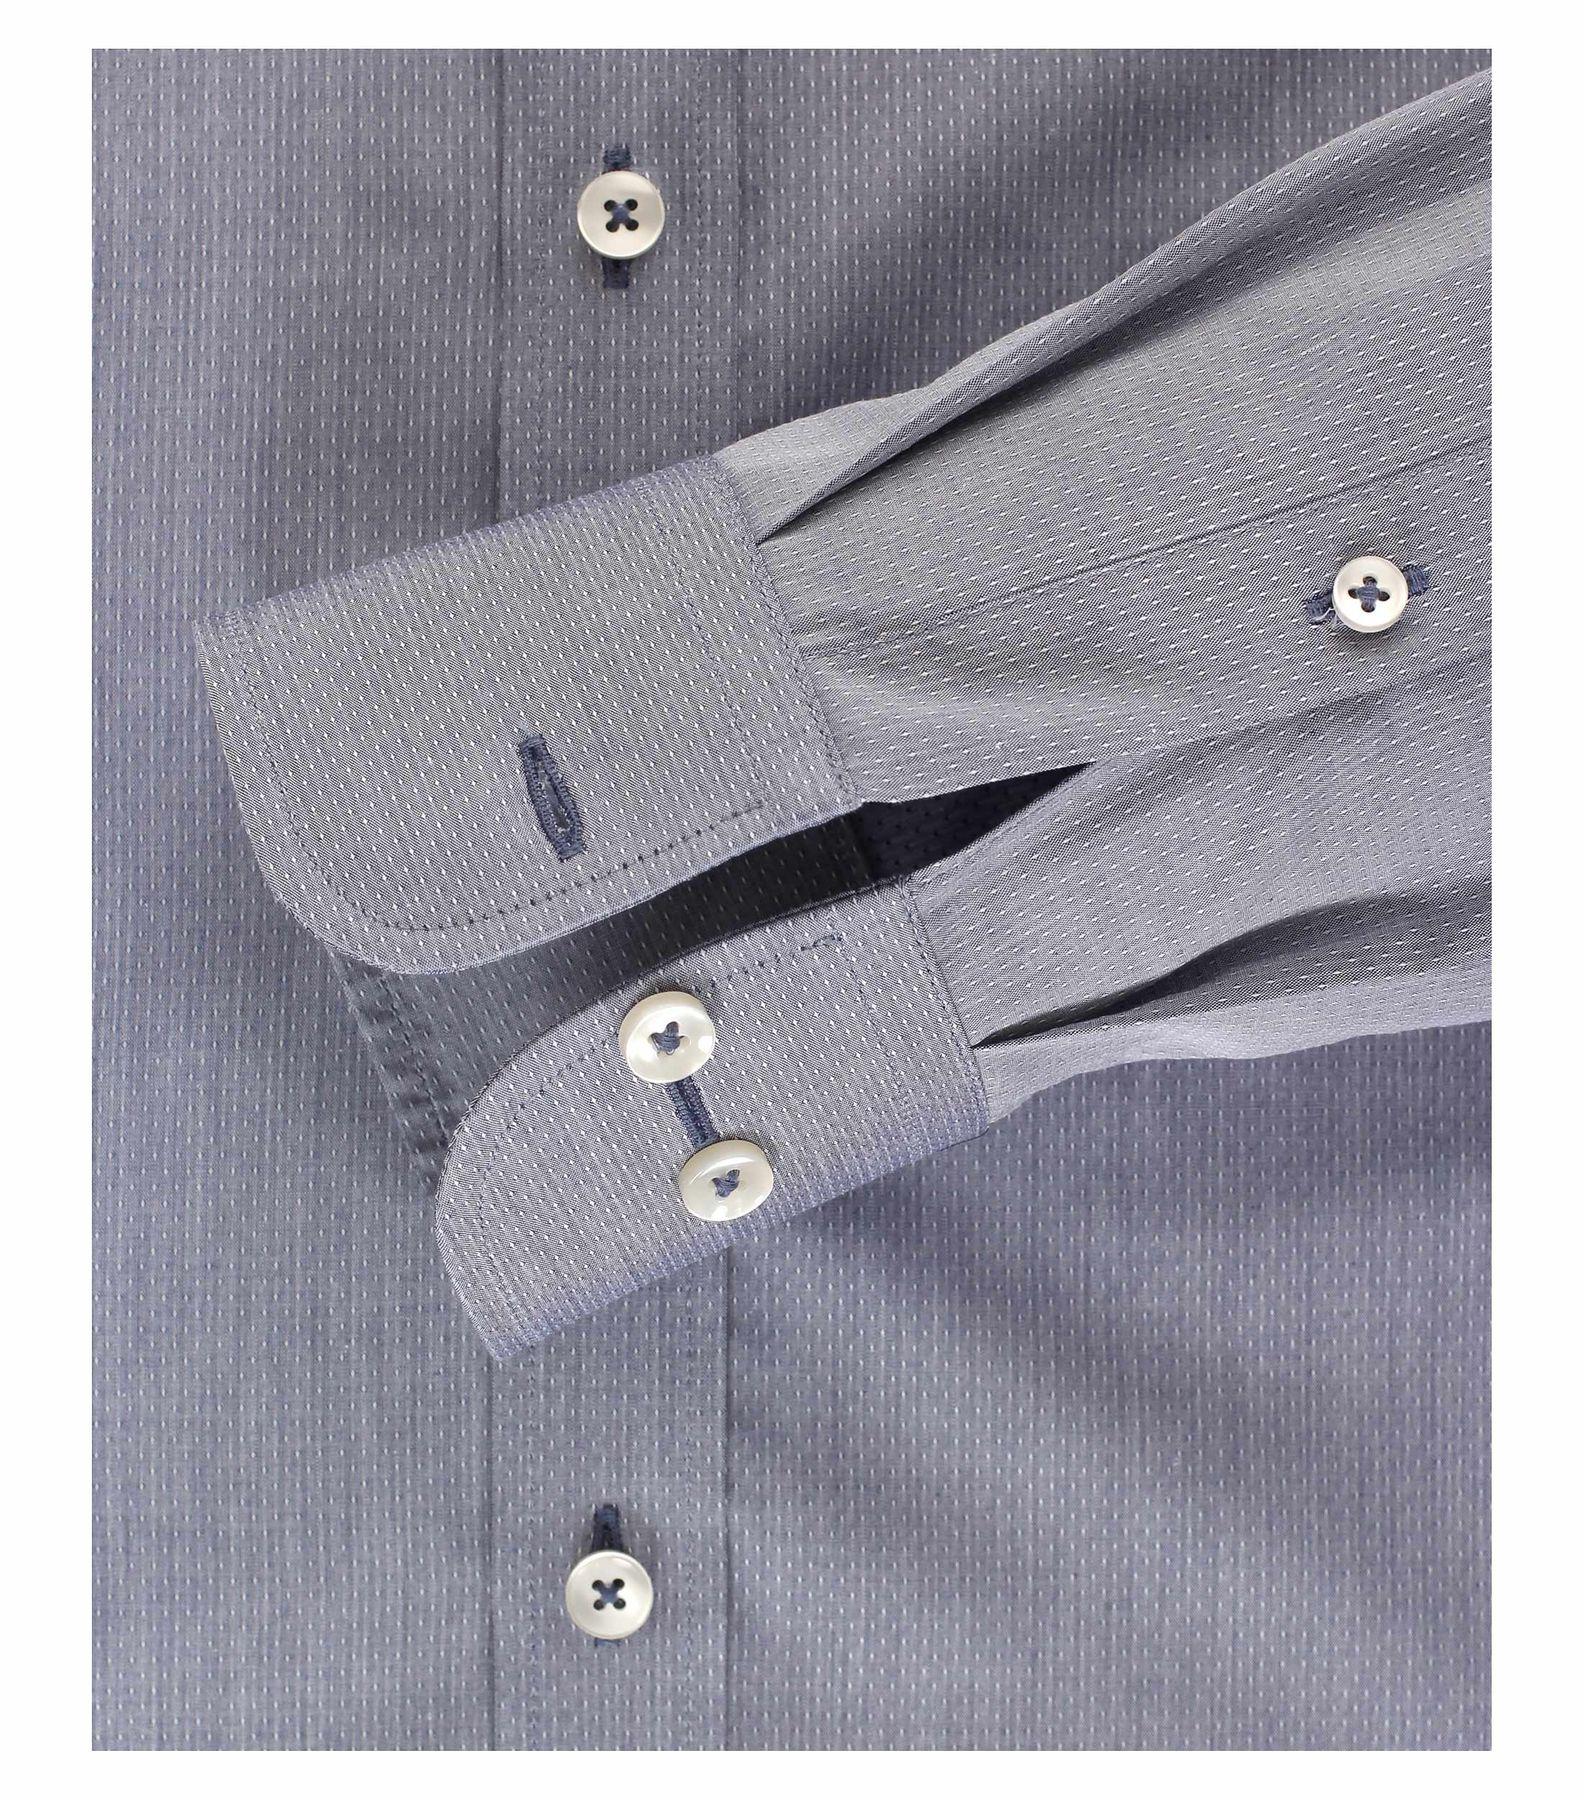 Casa Moda - Modern Fit - Herren langarm Hemd mit Shark Kragen, Uninah (372682600A) – Bild 13